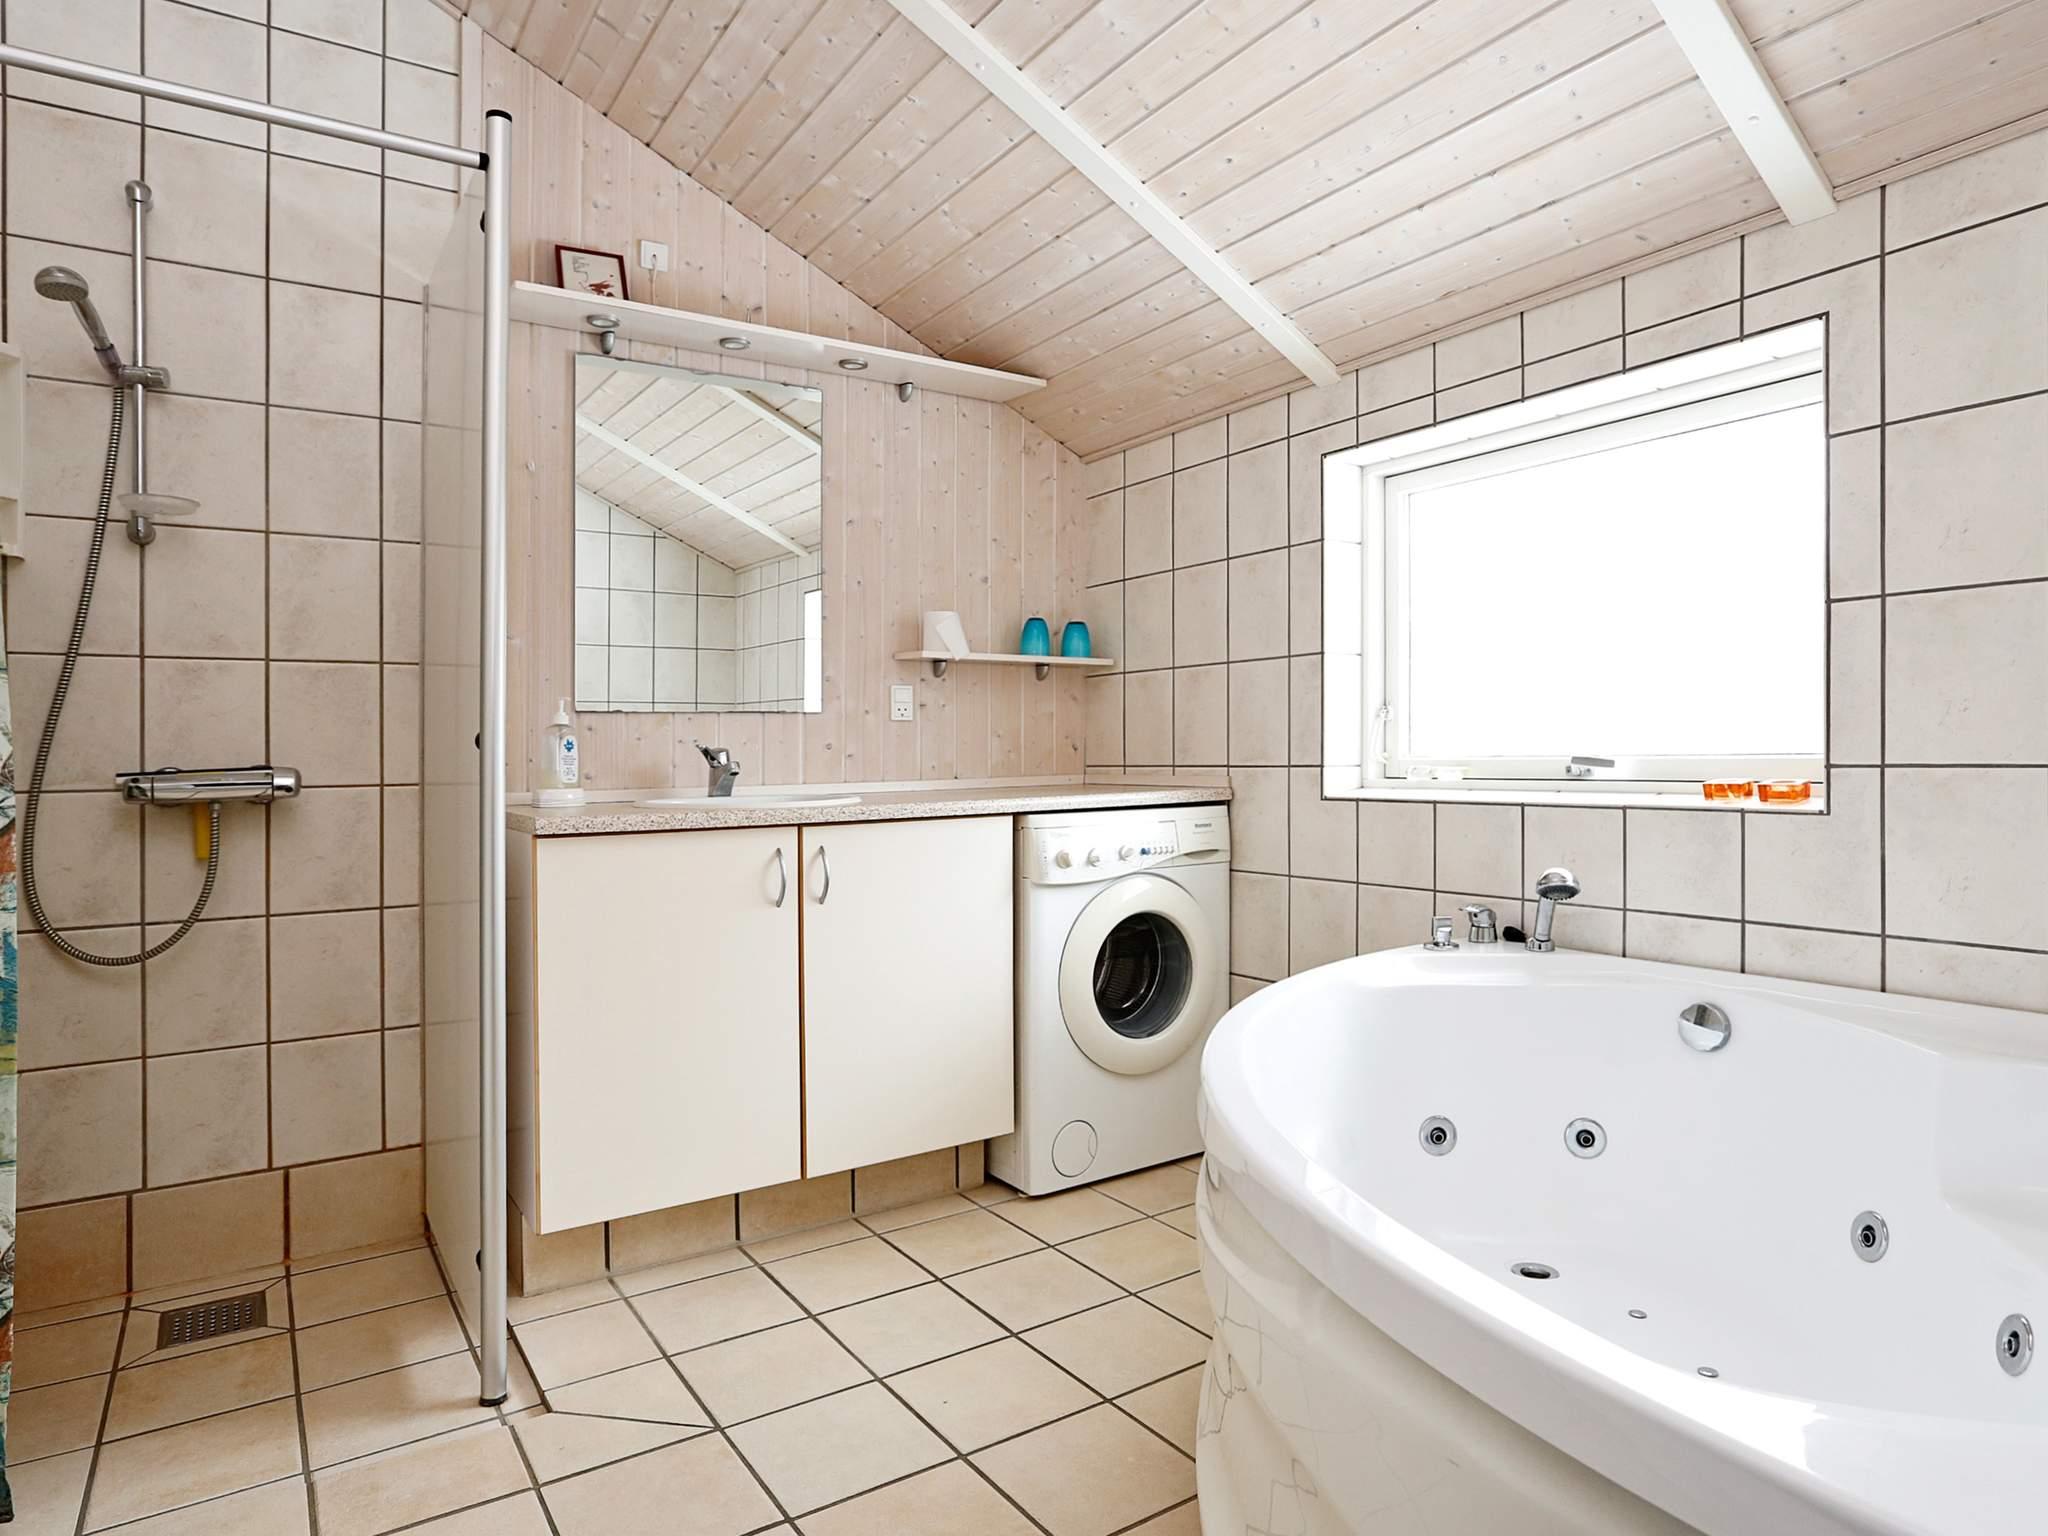 Ferienhaus Smidstrup Strand (86601), Smidstrup, , Nordseeland, Dänemark, Bild 12